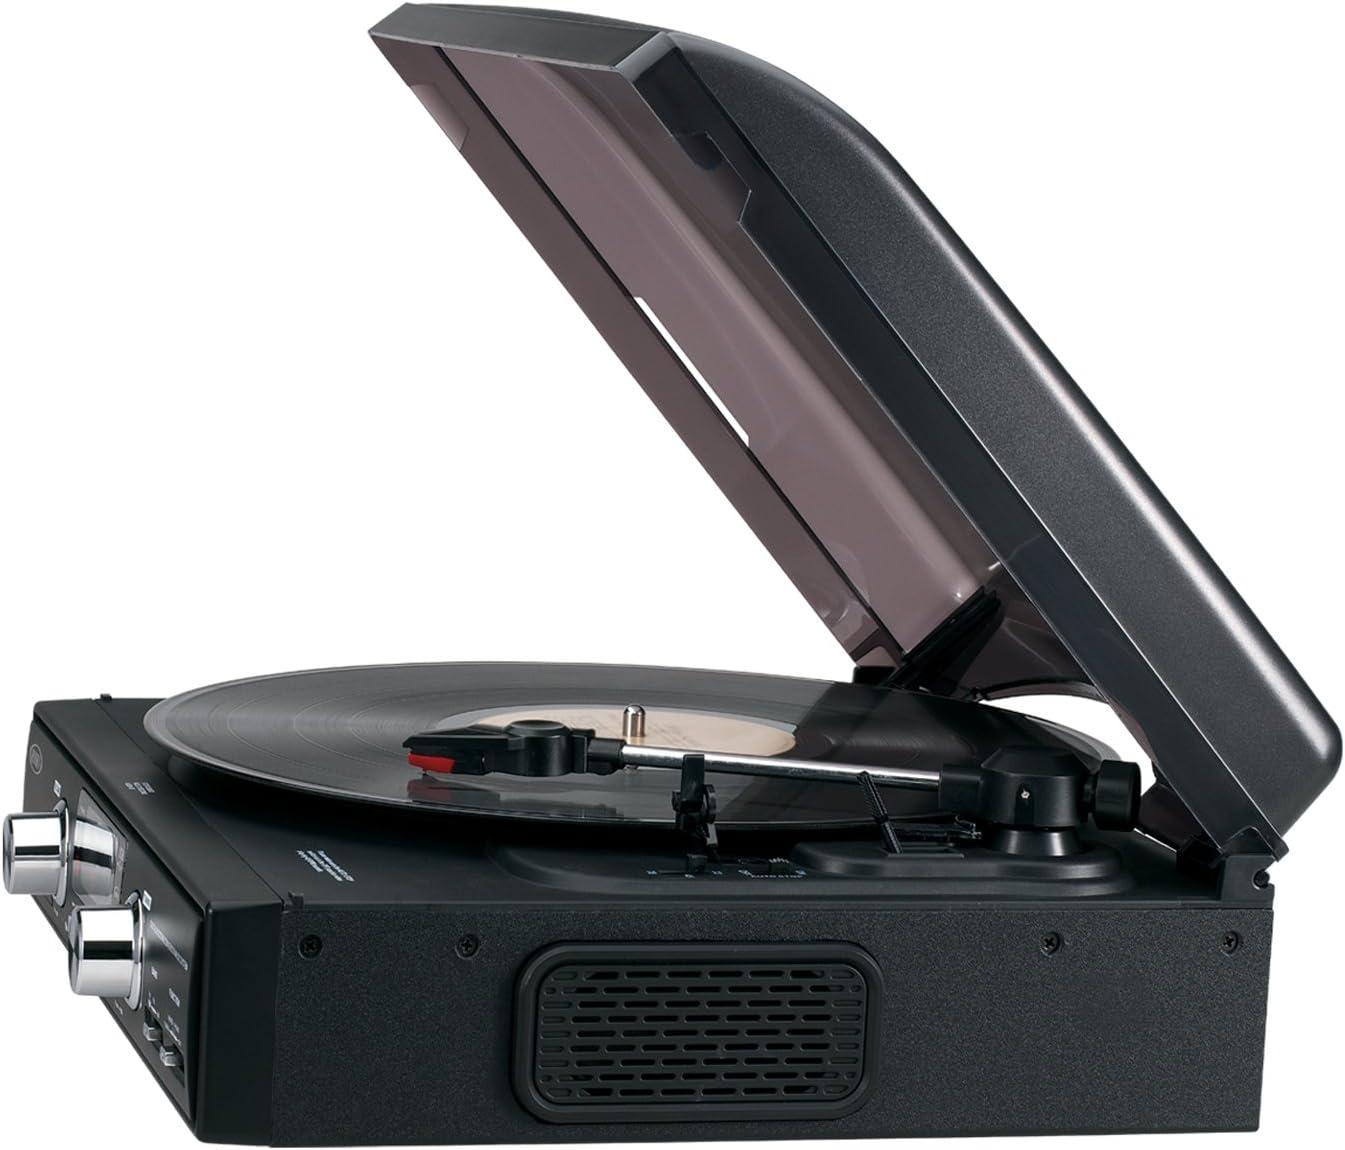 Amazon.com: Jensen jta-460 estéreo de 3 velocidades ...